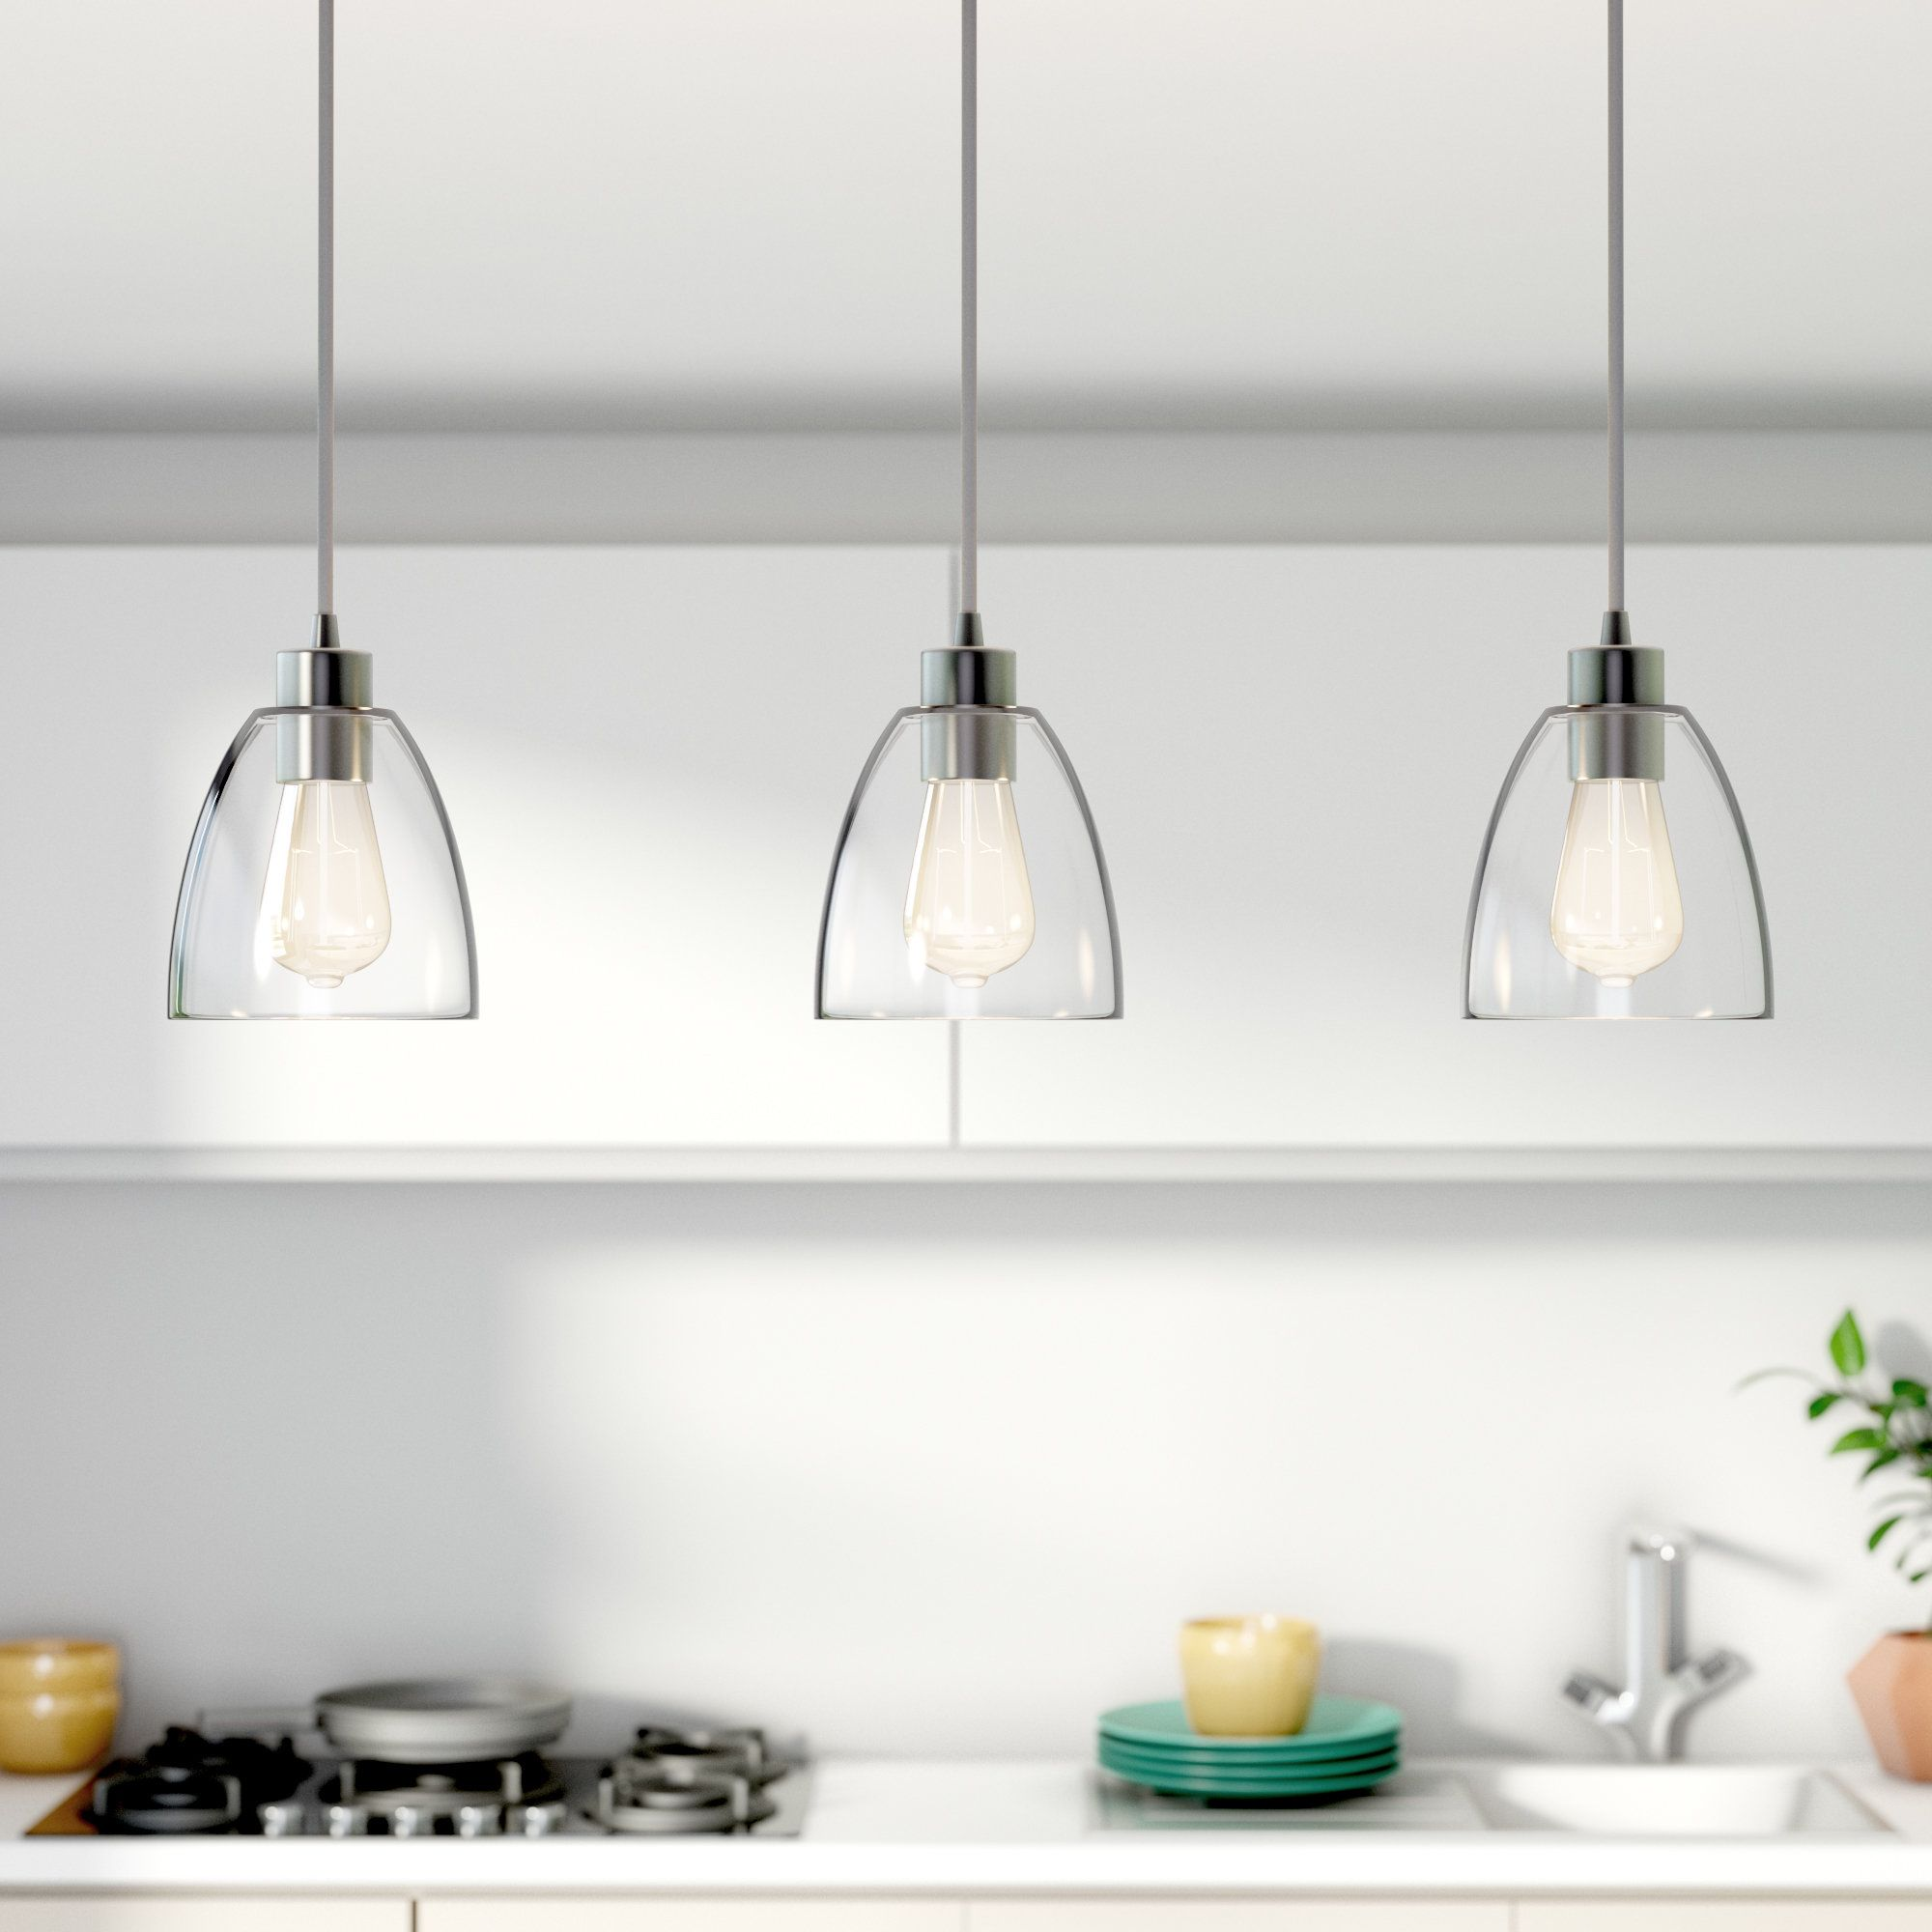 Cadorette 3-Light Kitchen Island Pendant   Products ...